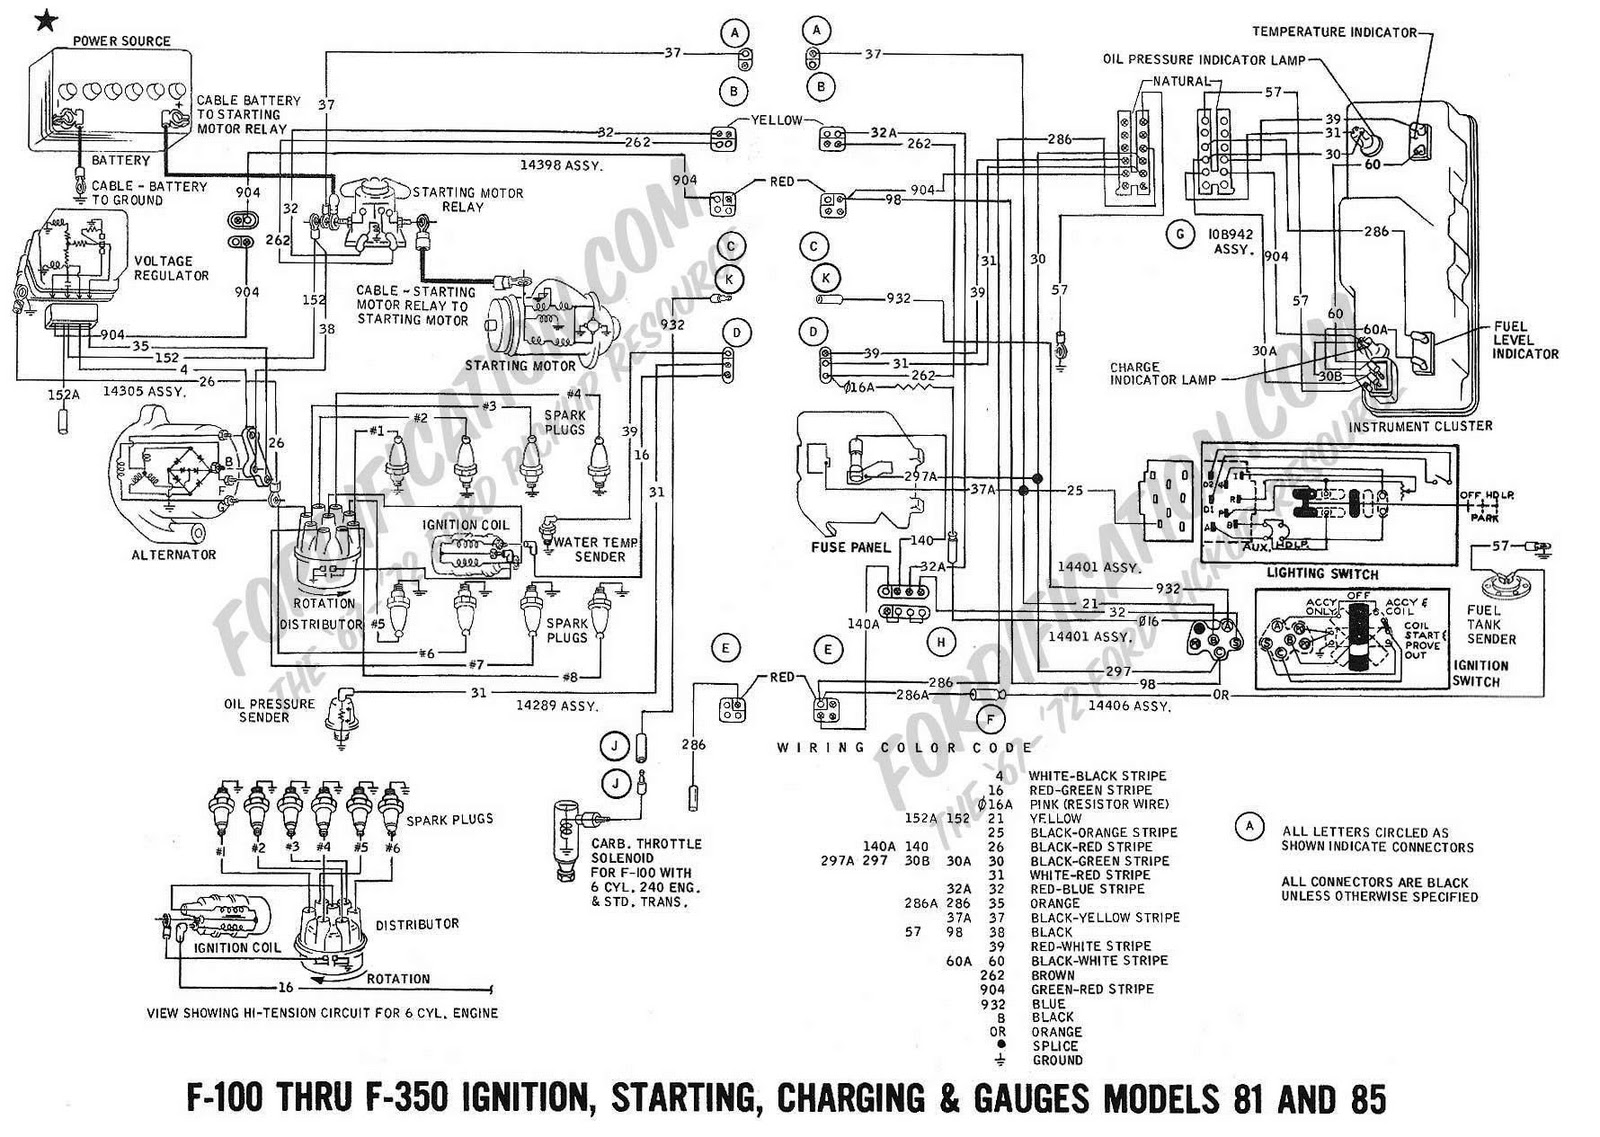 Hyundai Elantra Wiring Harness Diagram  Auto Electrical